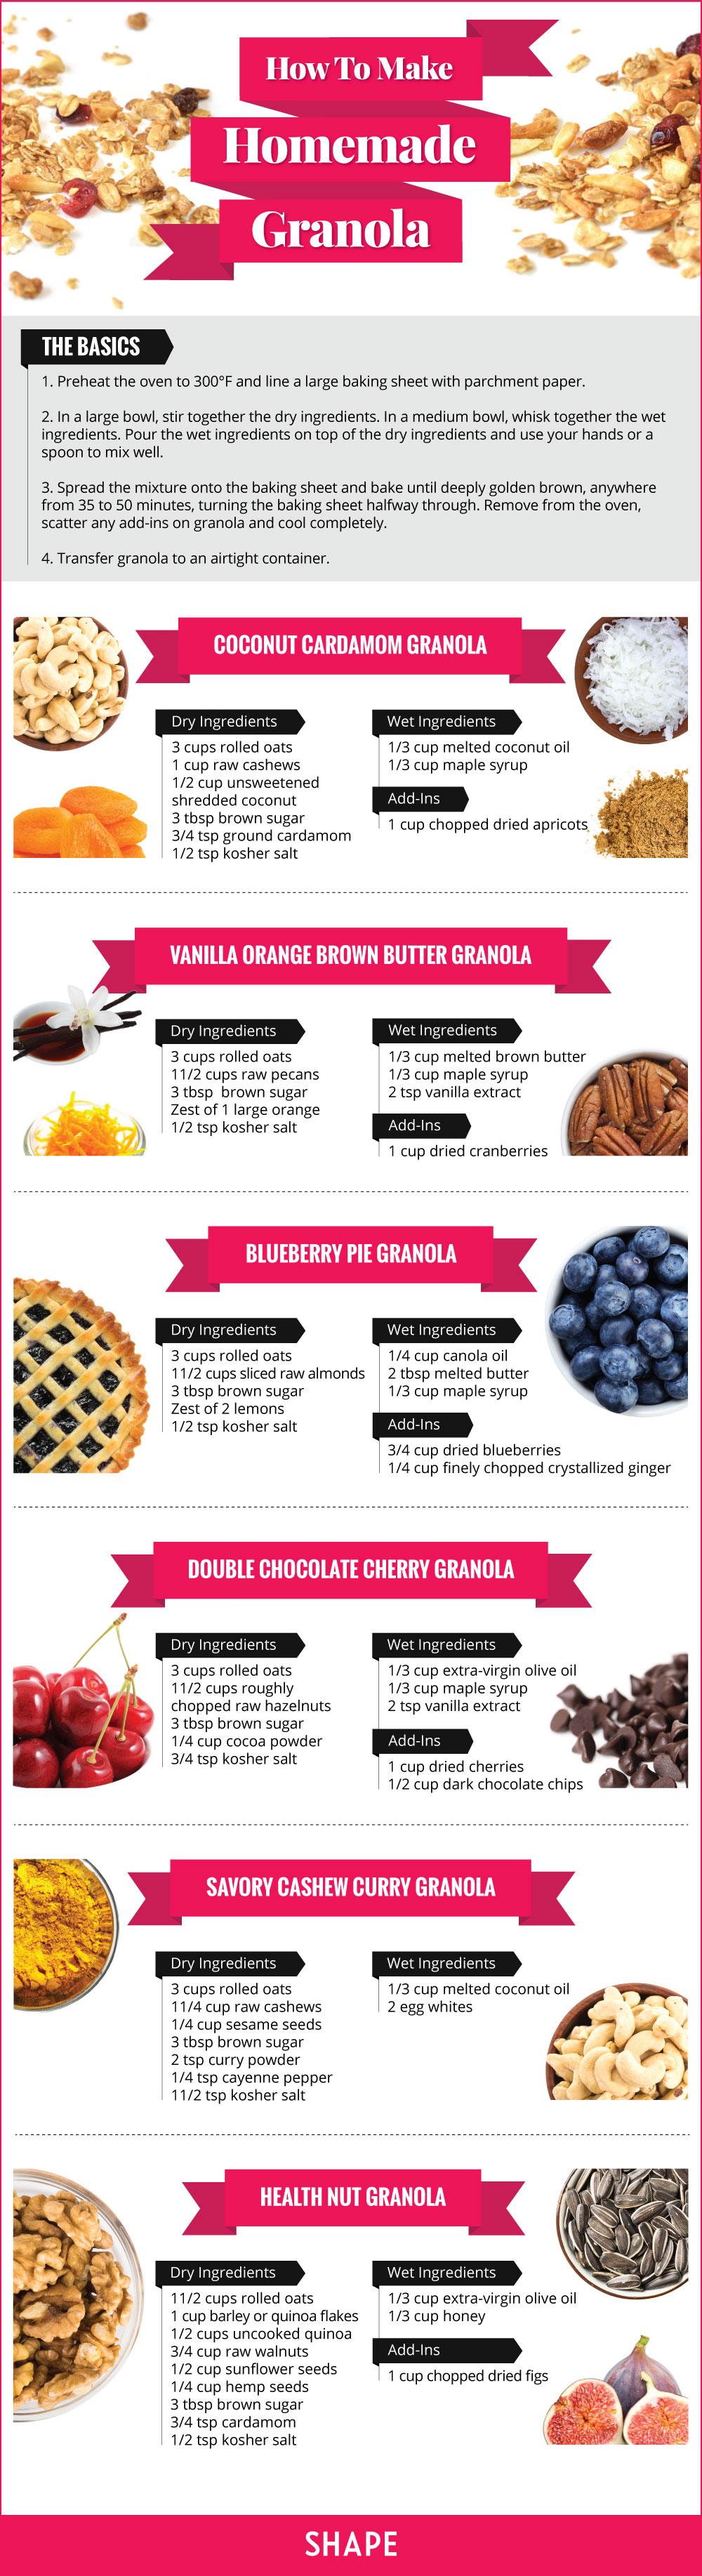 Granola-infographic.jpg